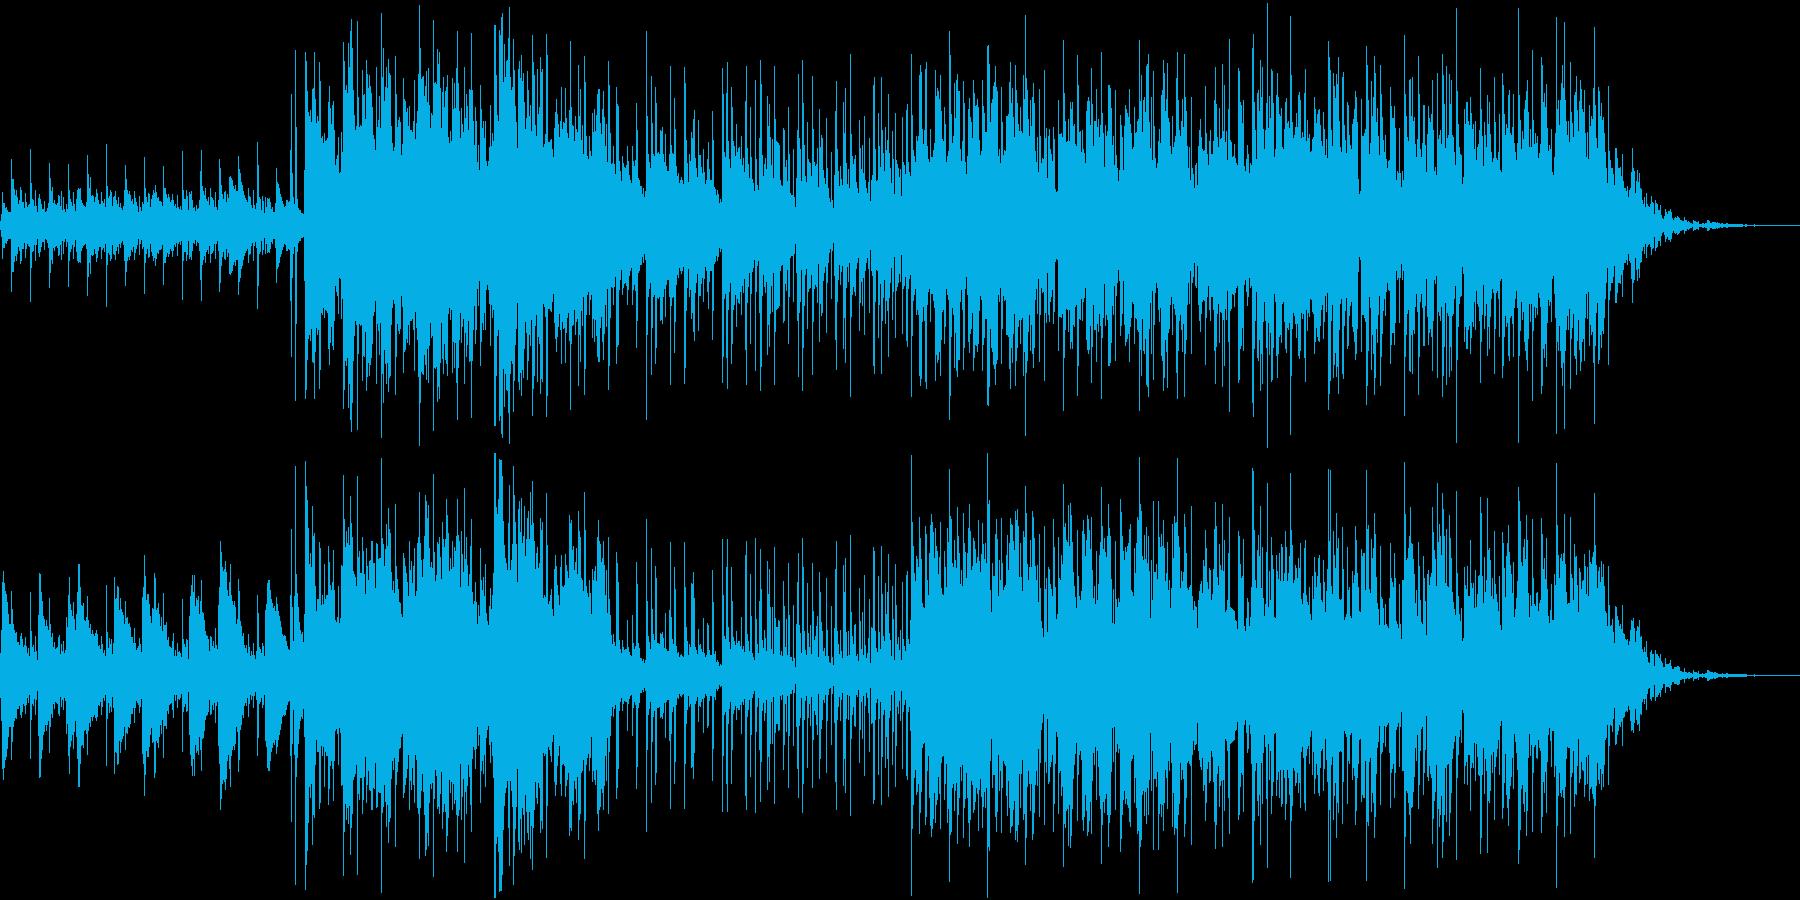 R&Bせつないラブソング・カラオケの再生済みの波形